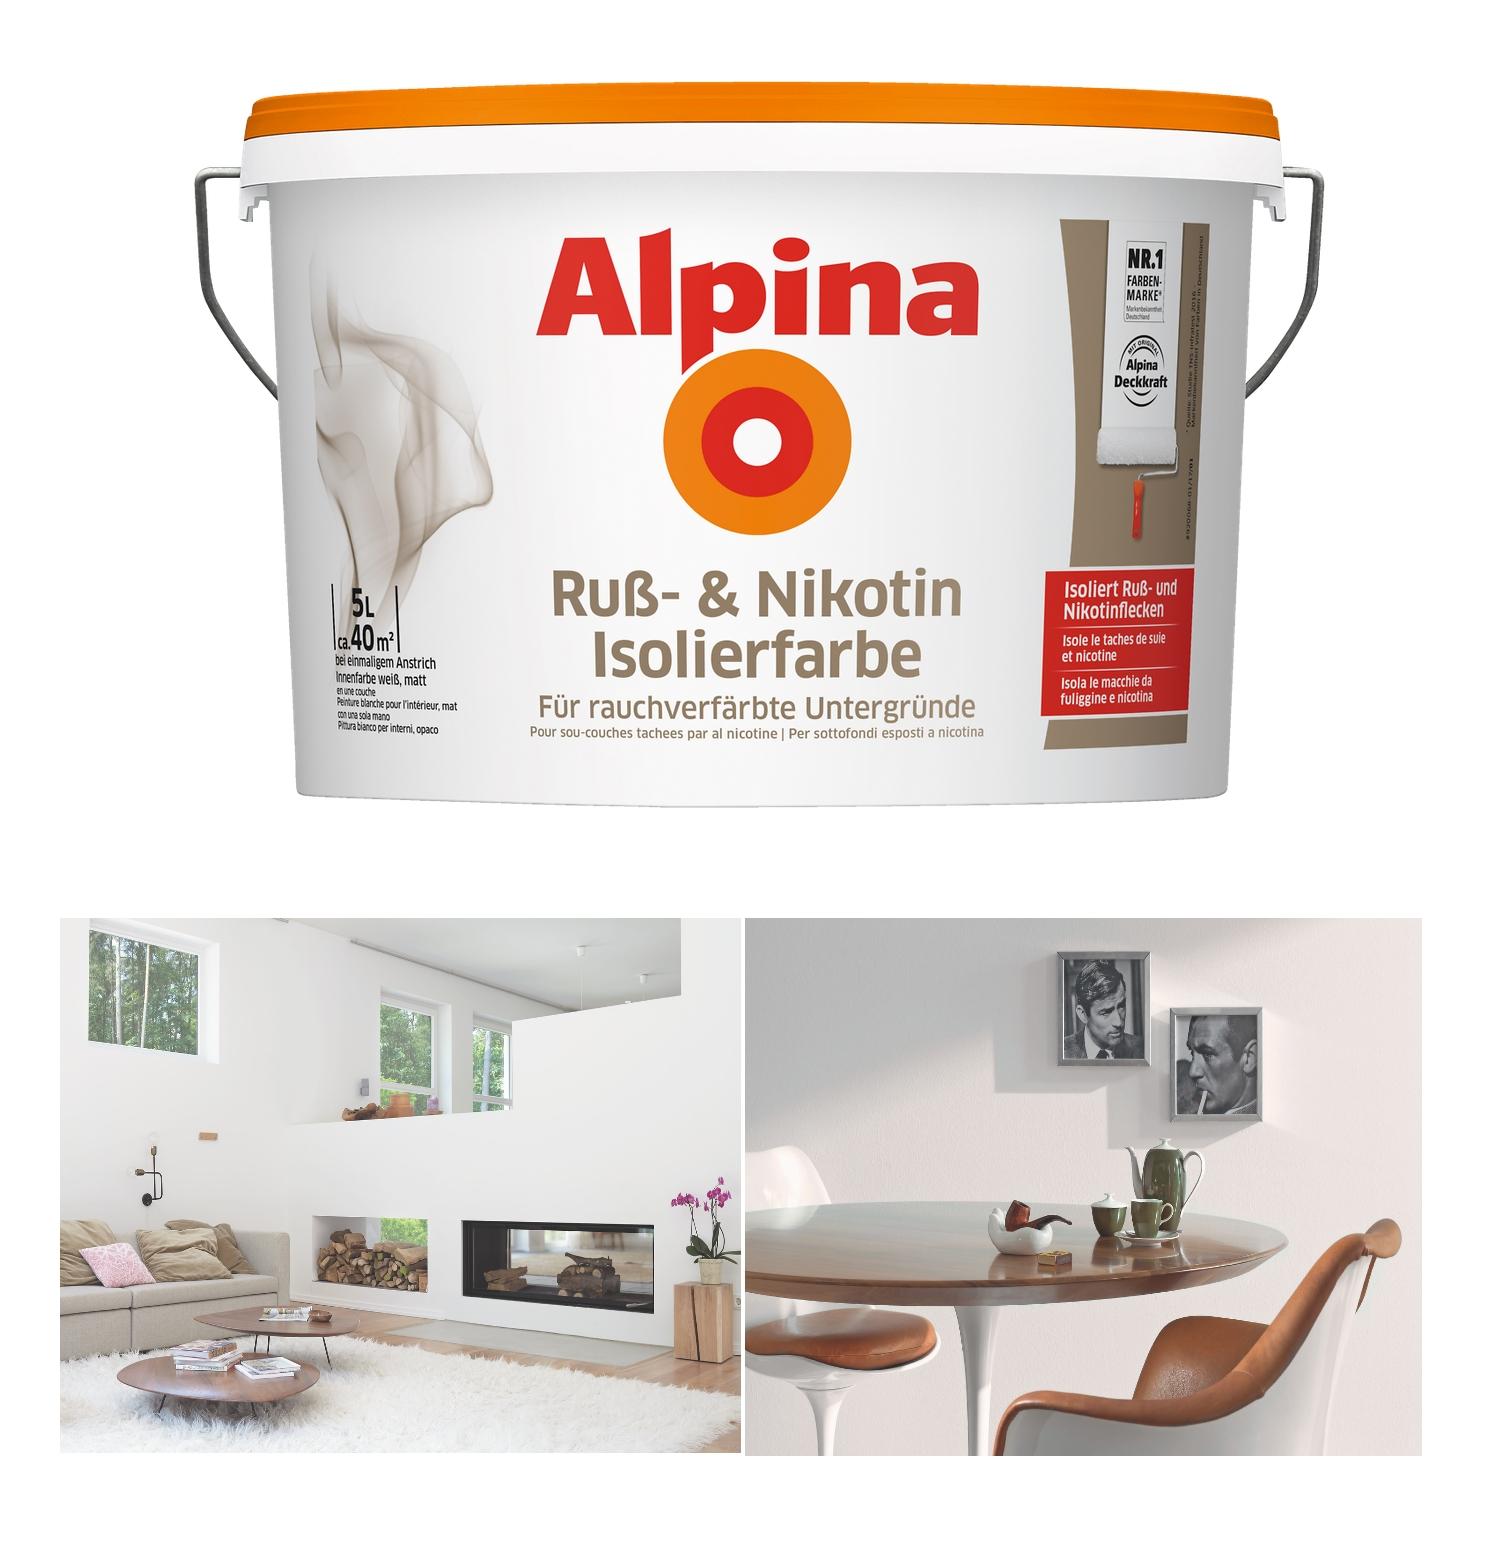 Alpina Bad Küchenfarbe: Rühl Farben 5 L Design White Innenfarbe Biala, Weiß, Matt